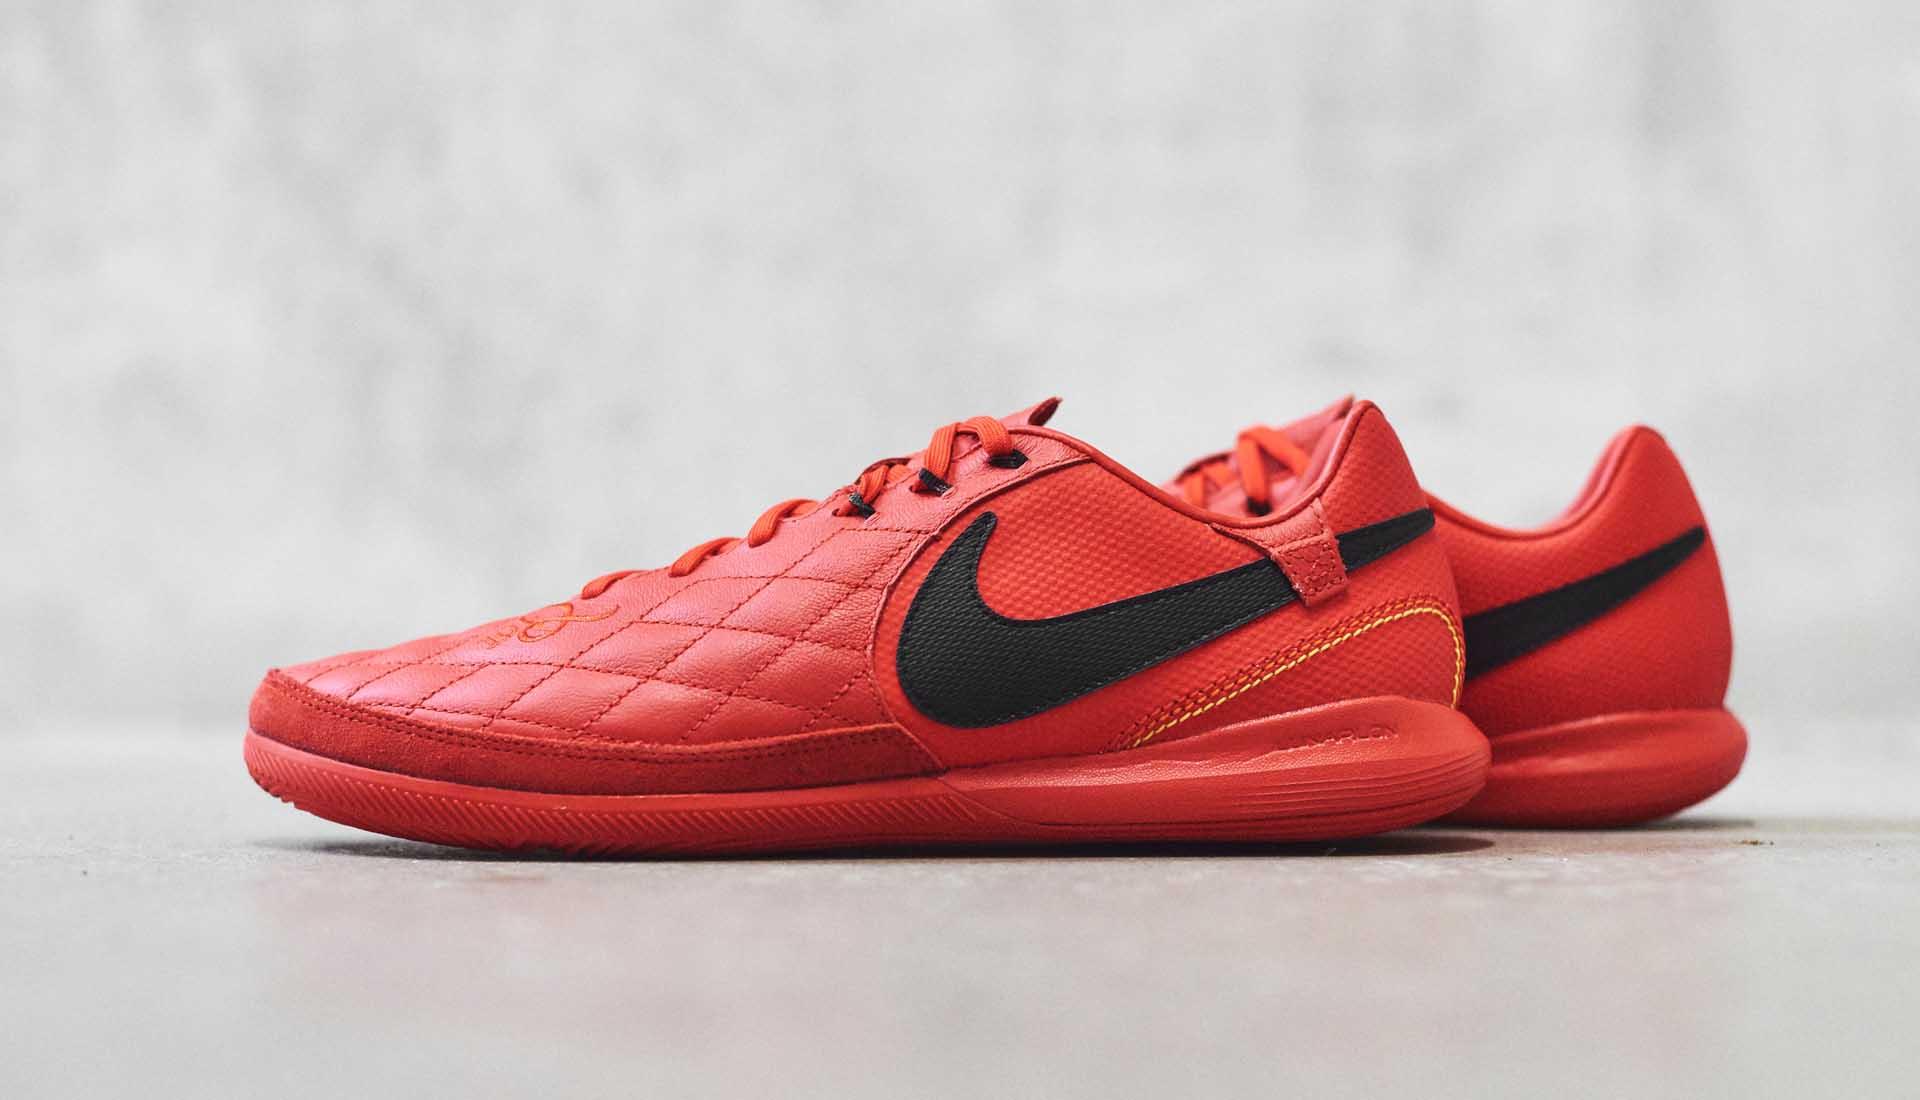 chaussures-football-Nike-Tiempo-X-10R-Milan-img1